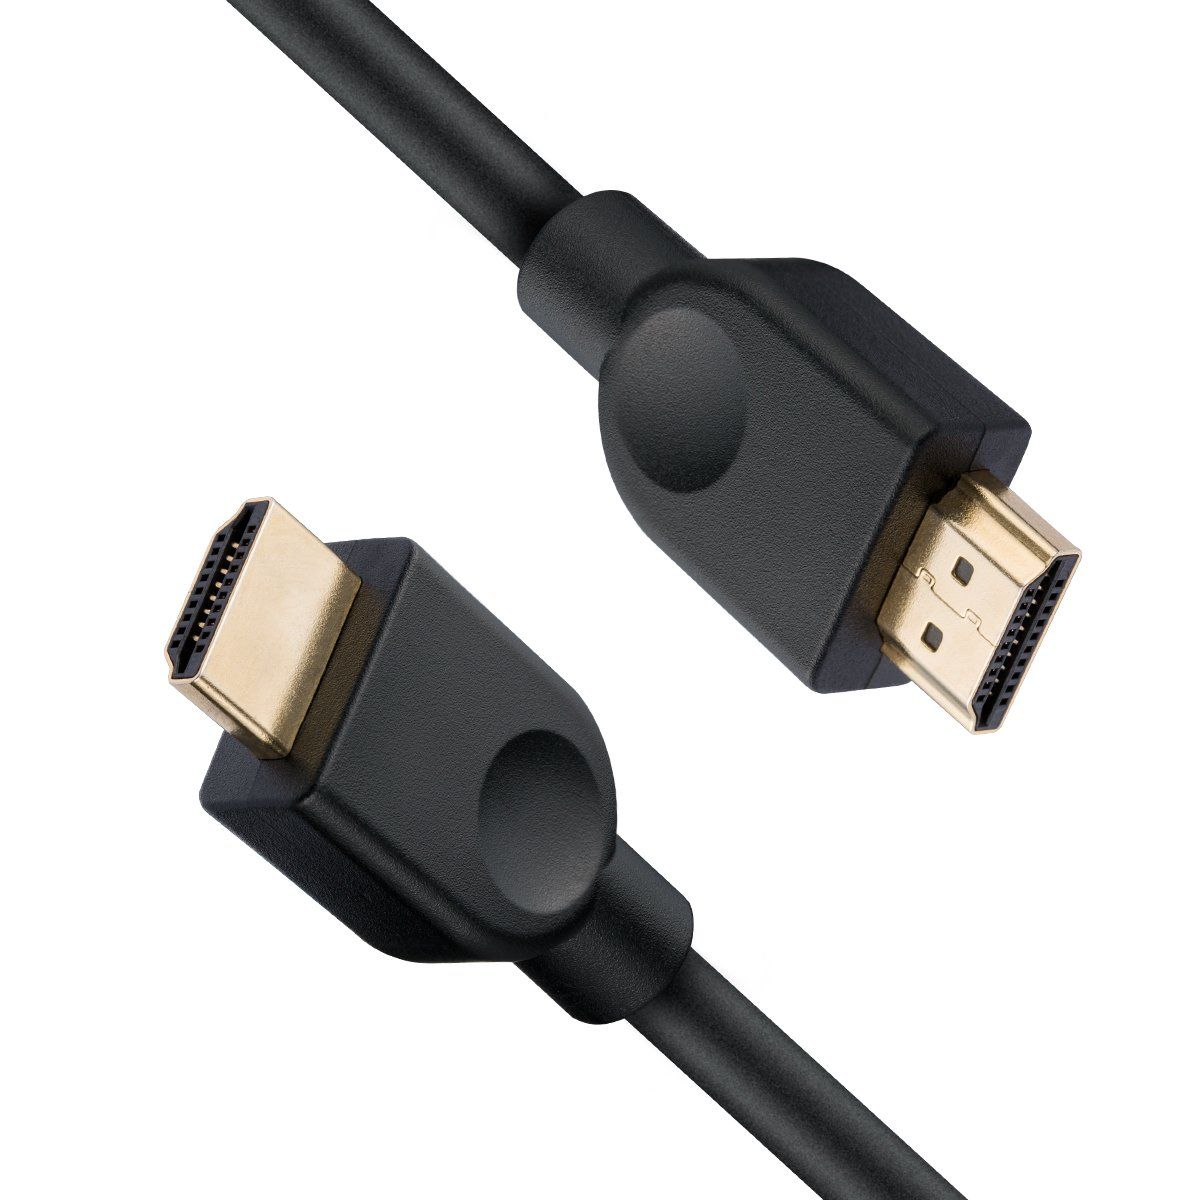 HDMI Kabel - 4.5m Hochgeschwindigkeits HDMI Kabel: Amazon.de: Elektronik